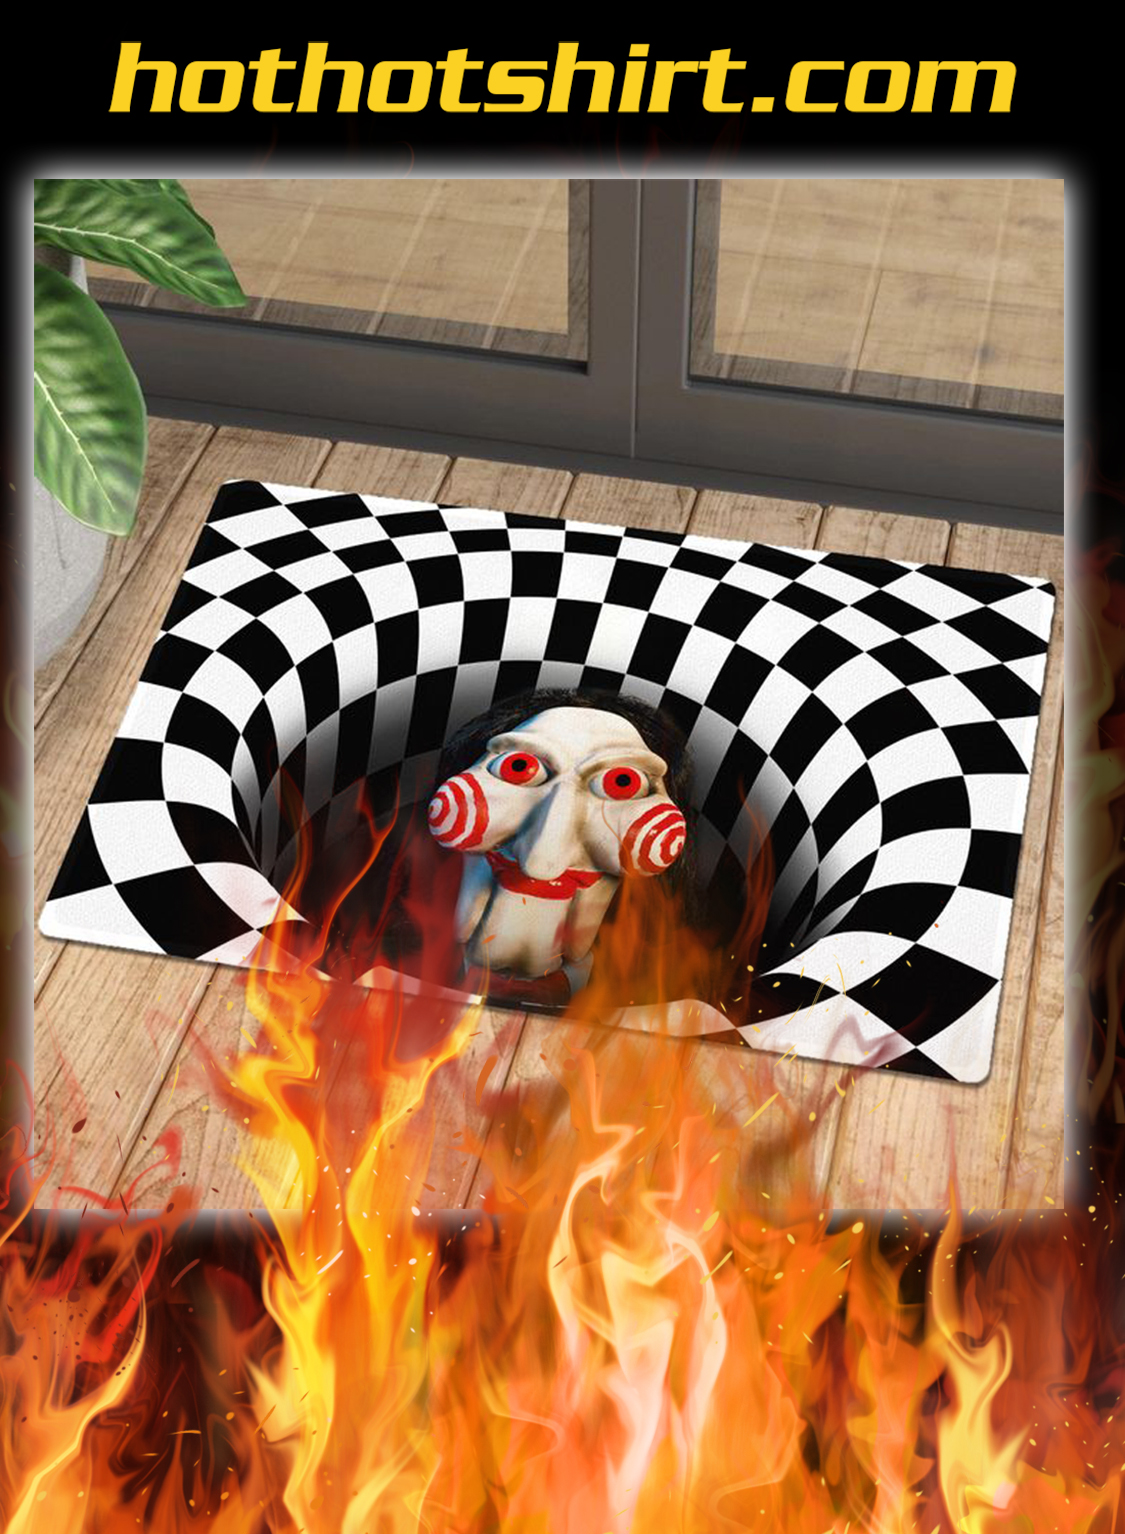 Billy jigsaw illusion halloween doormat